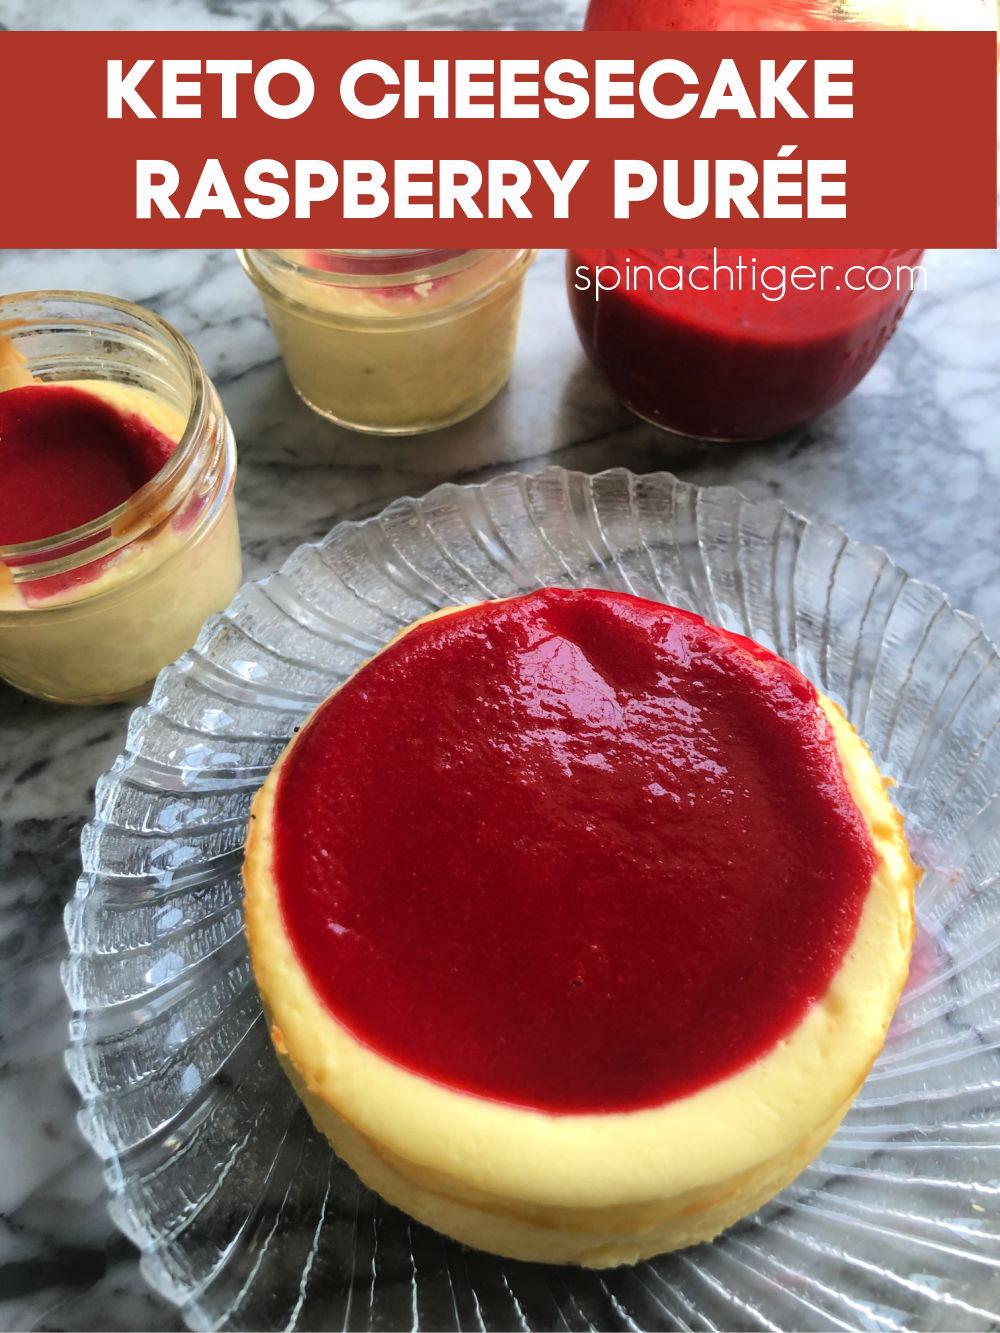 Cheesecake with Sugar Free Raspberry Puree